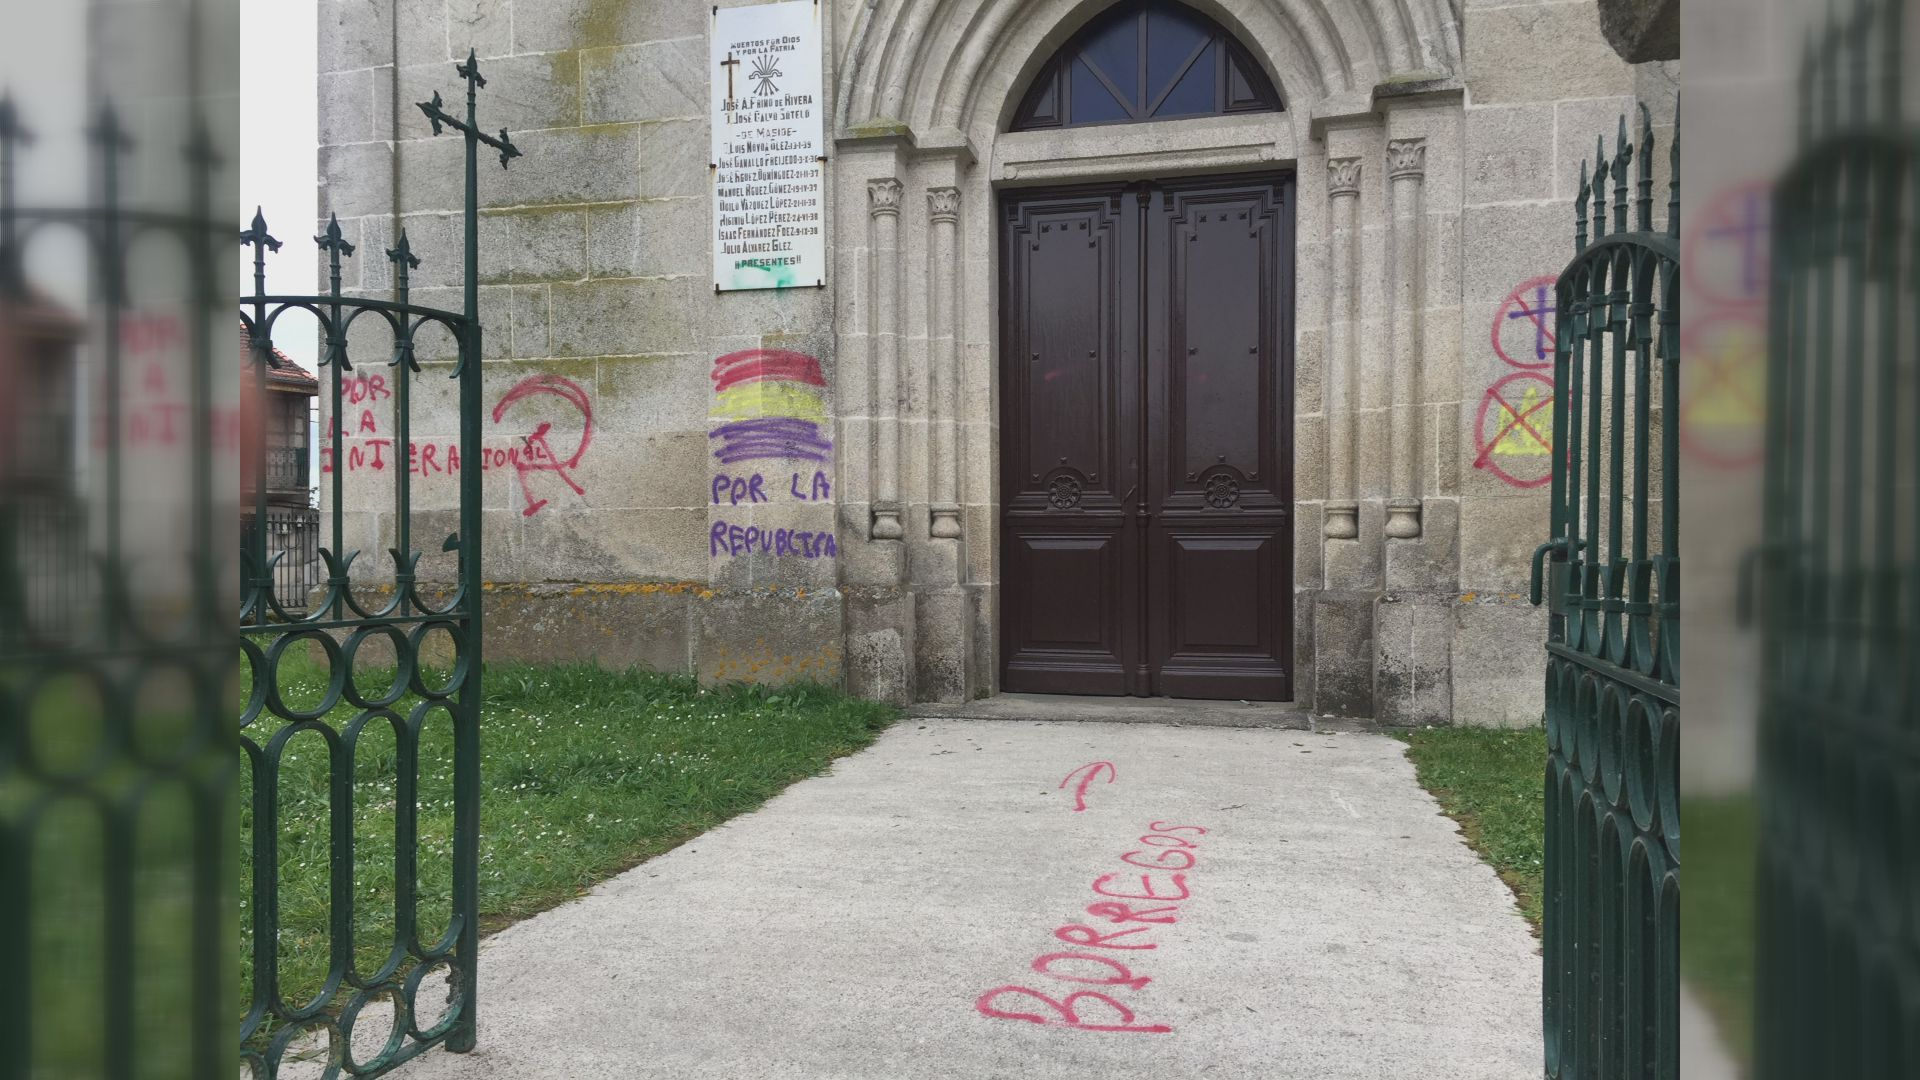 Pintadas a favor de la República en la iglesia de Maside.EL OBISPO DE BARCELONA JUAN JOSÉ OMELLA